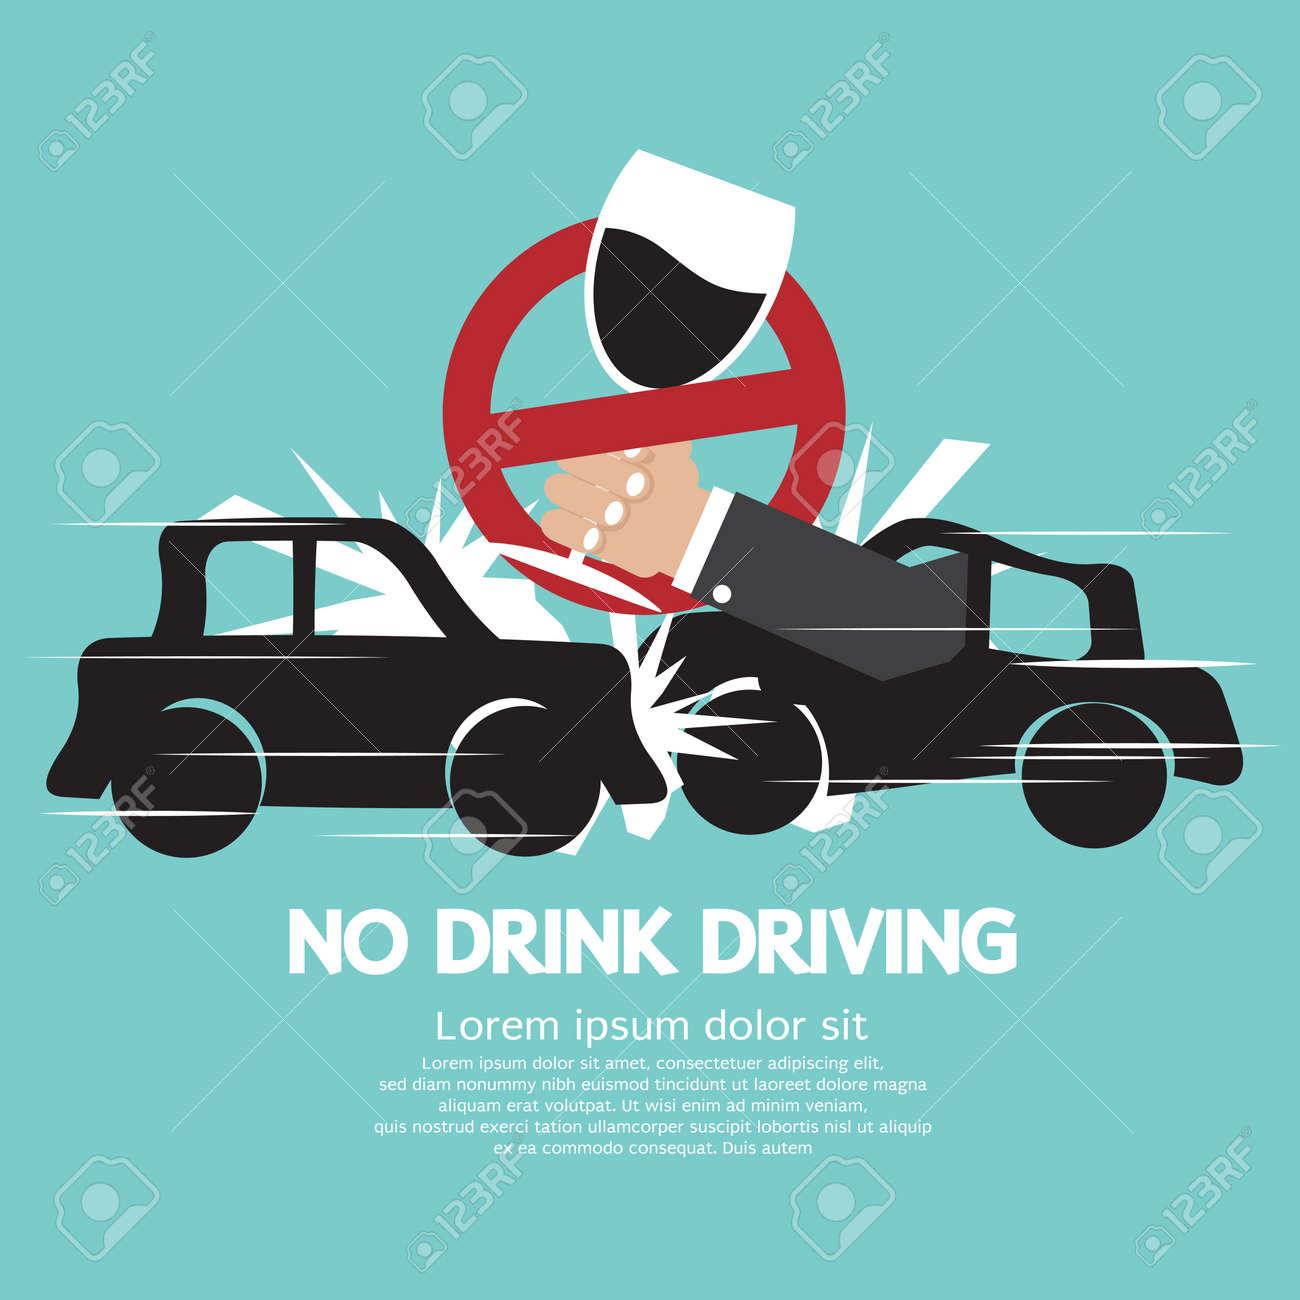 No Drink Driving Vector Illustration Stock Vector - 29025687